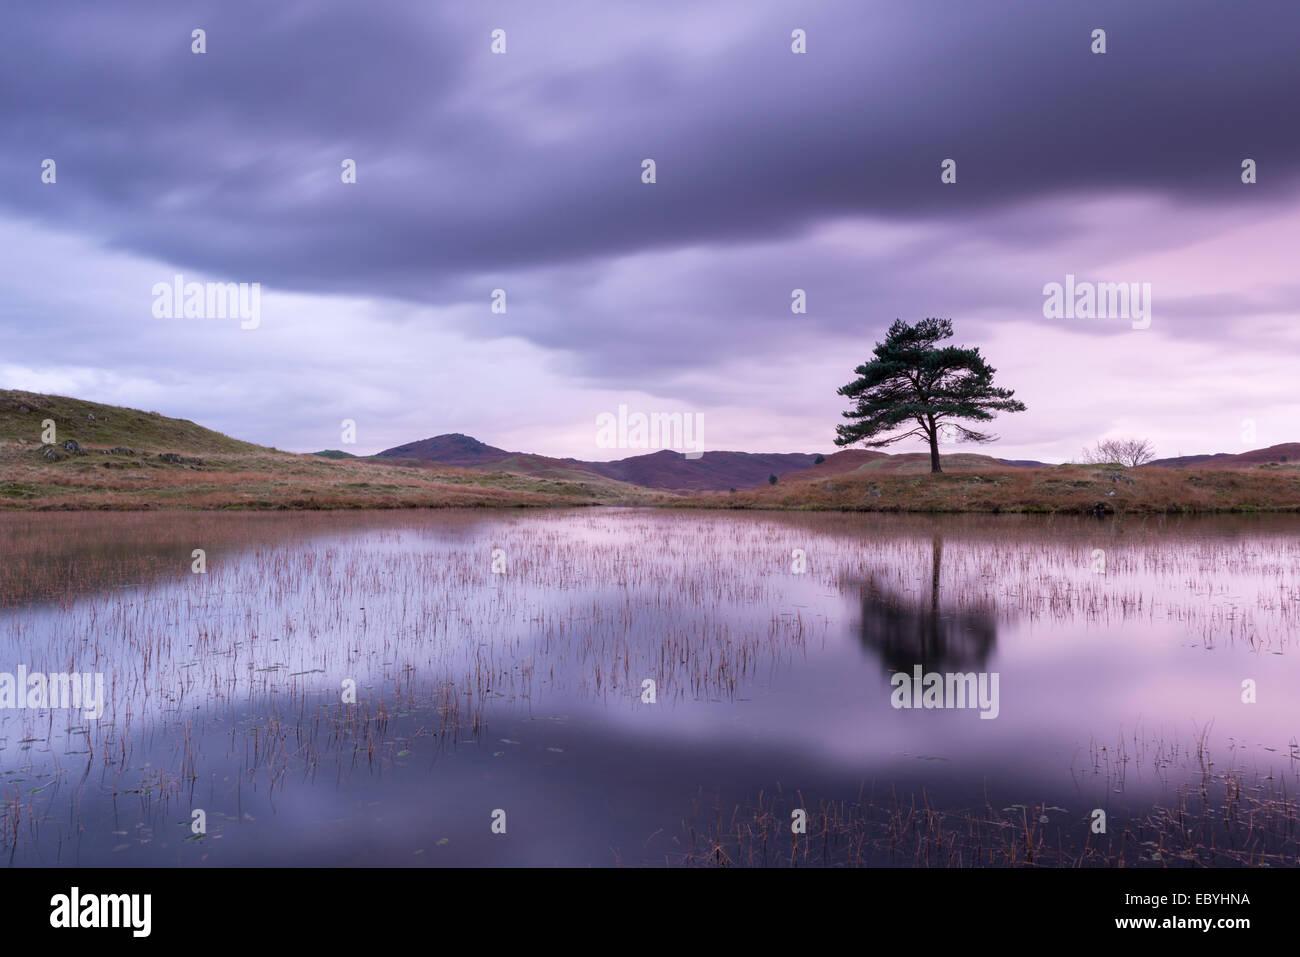 Kelly Hall Tarn en penumbra, Lake District, Cumbria, Inglaterra. Otoño (noviembre de 2014). Imagen De Stock